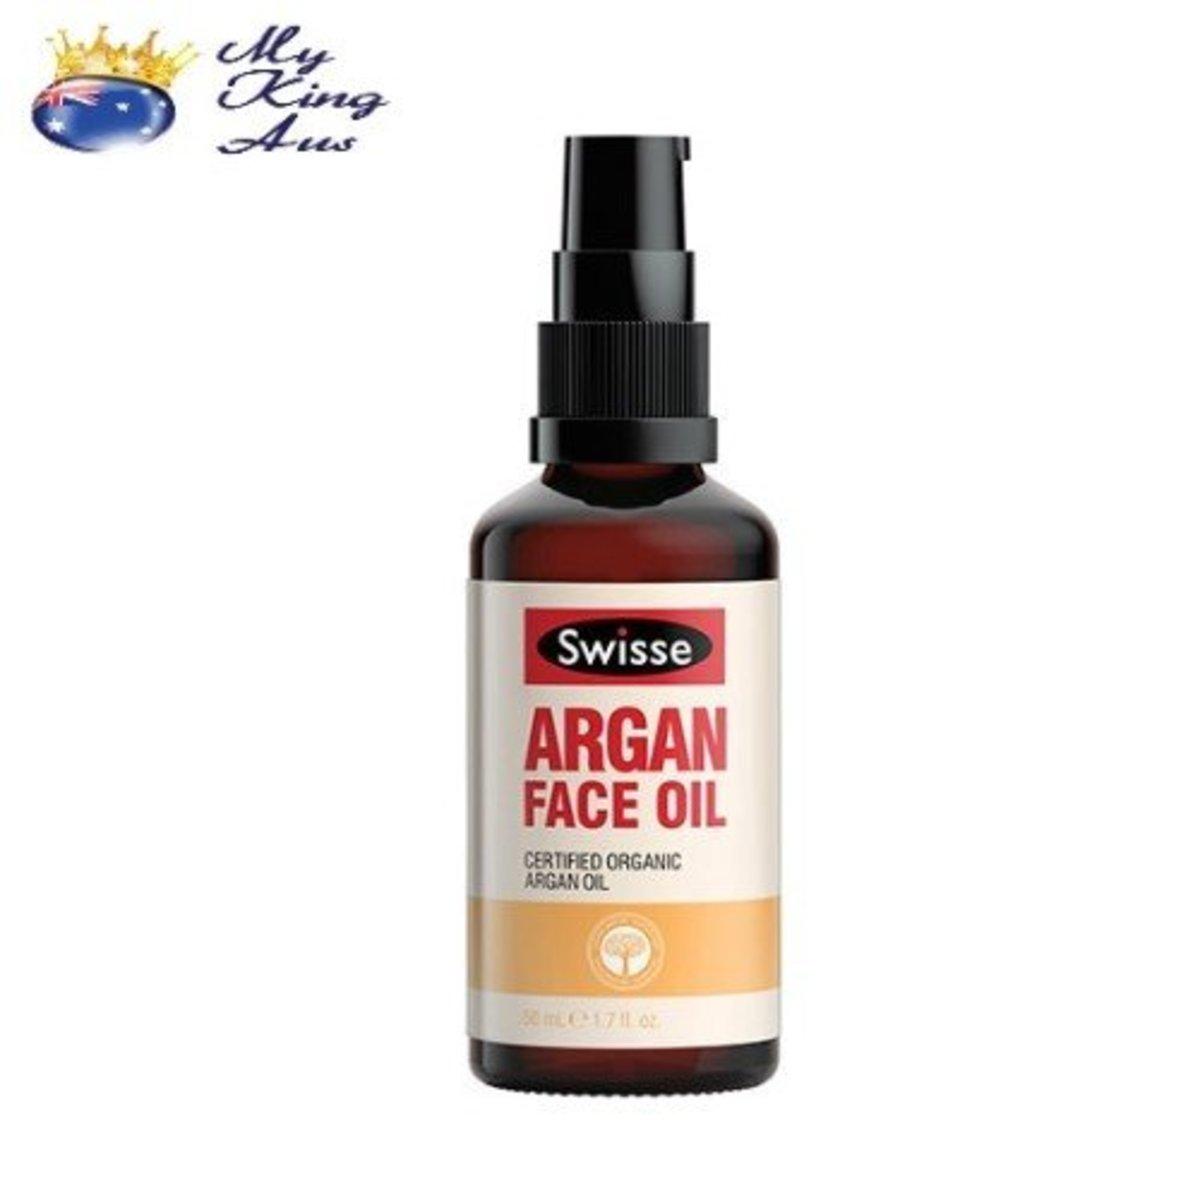 Certified Organic Argan Face Oil 50mL